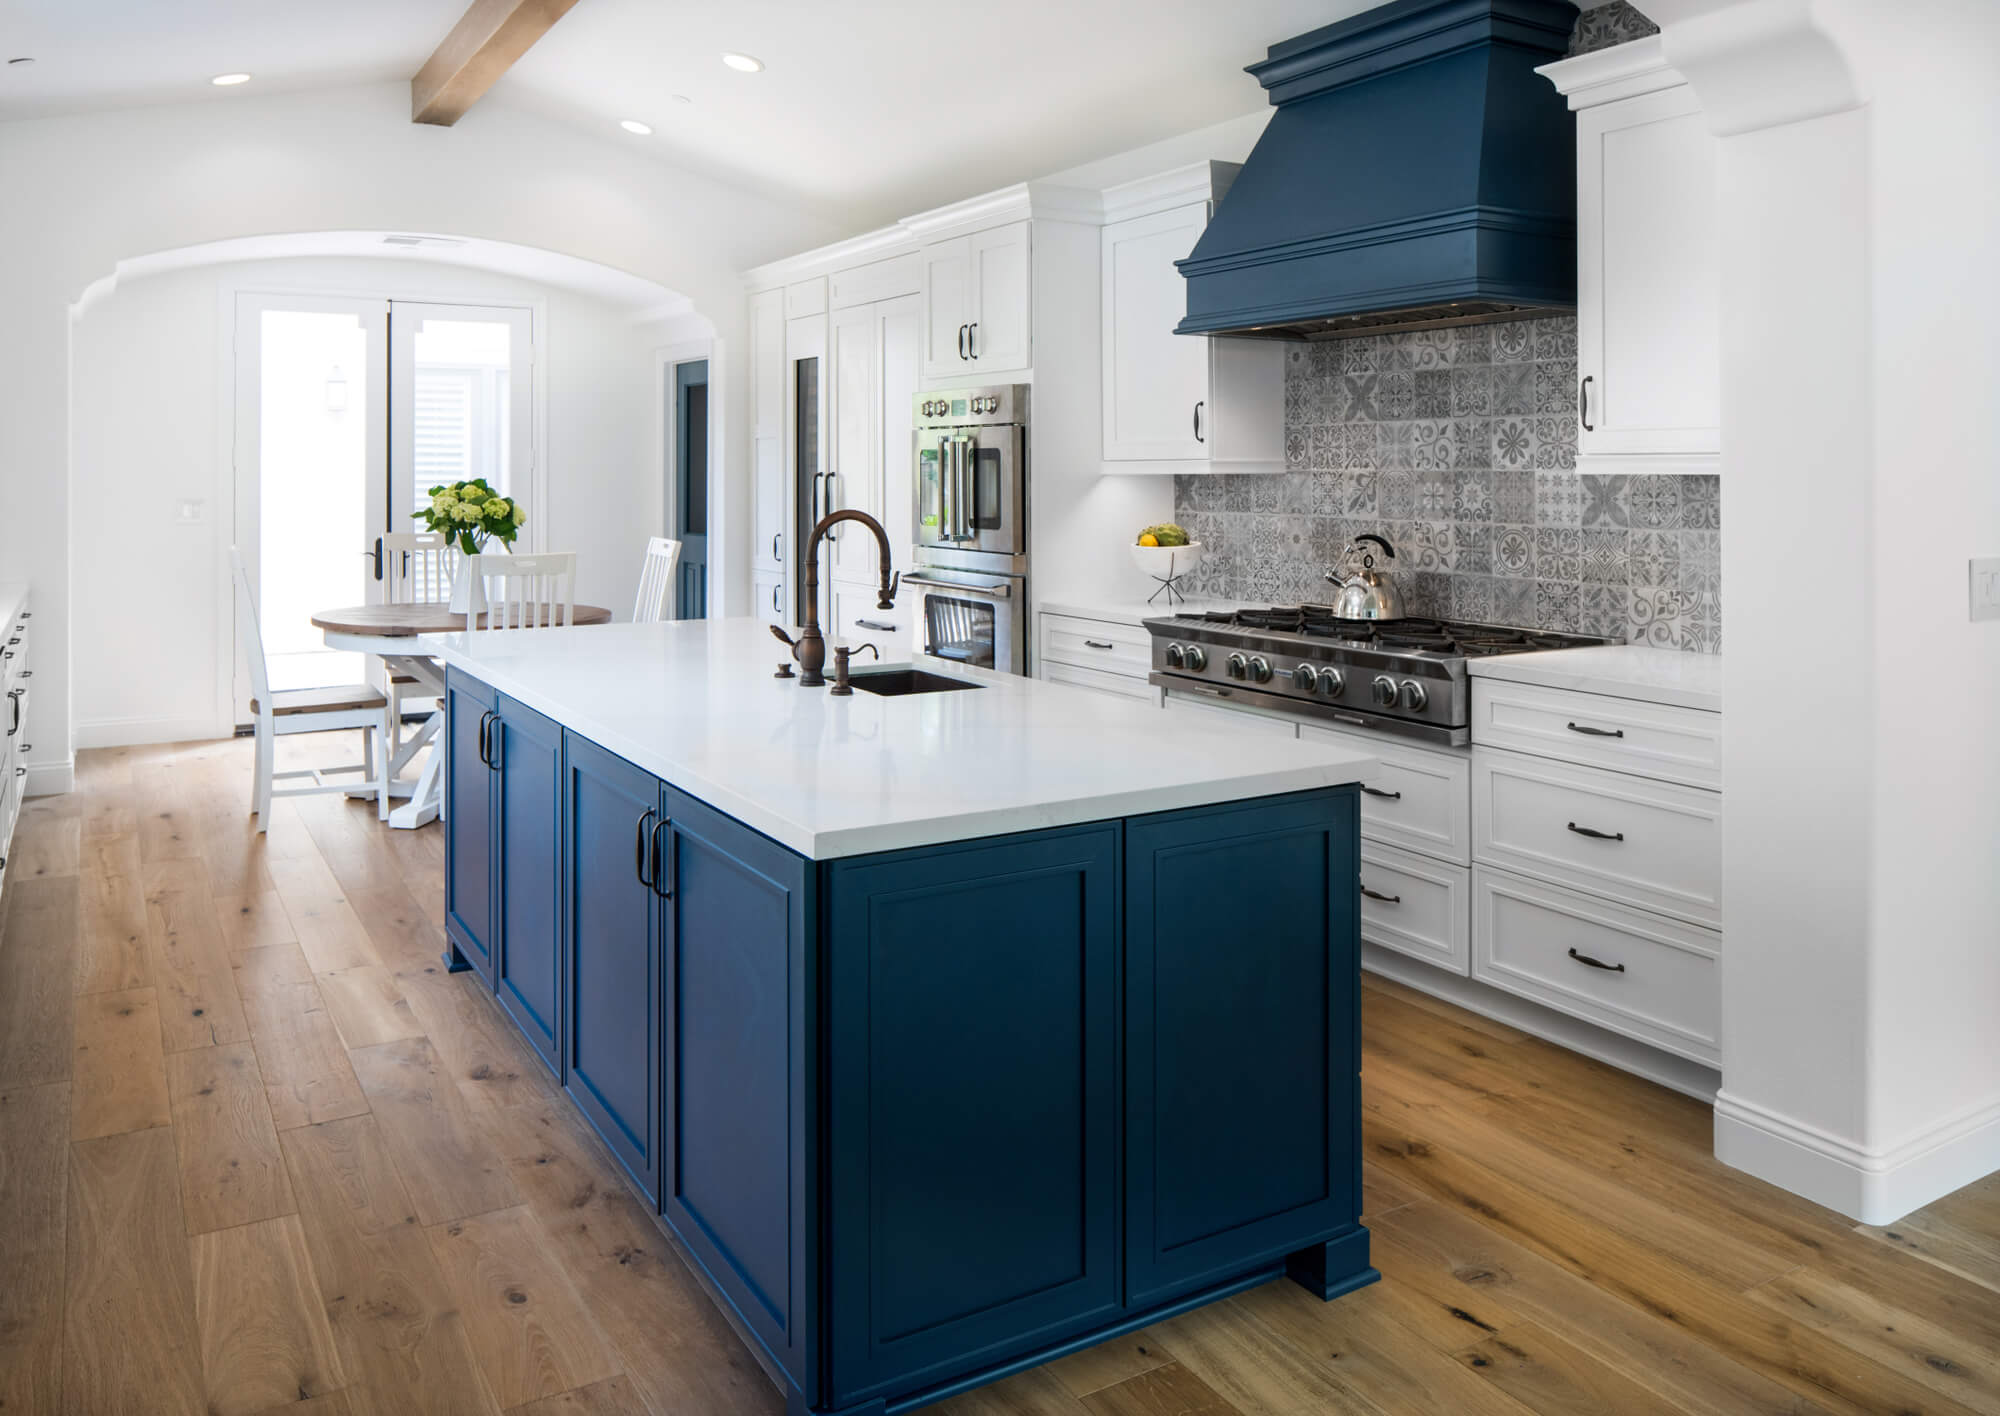 Top 5 Kitchen Design Trends of 2020